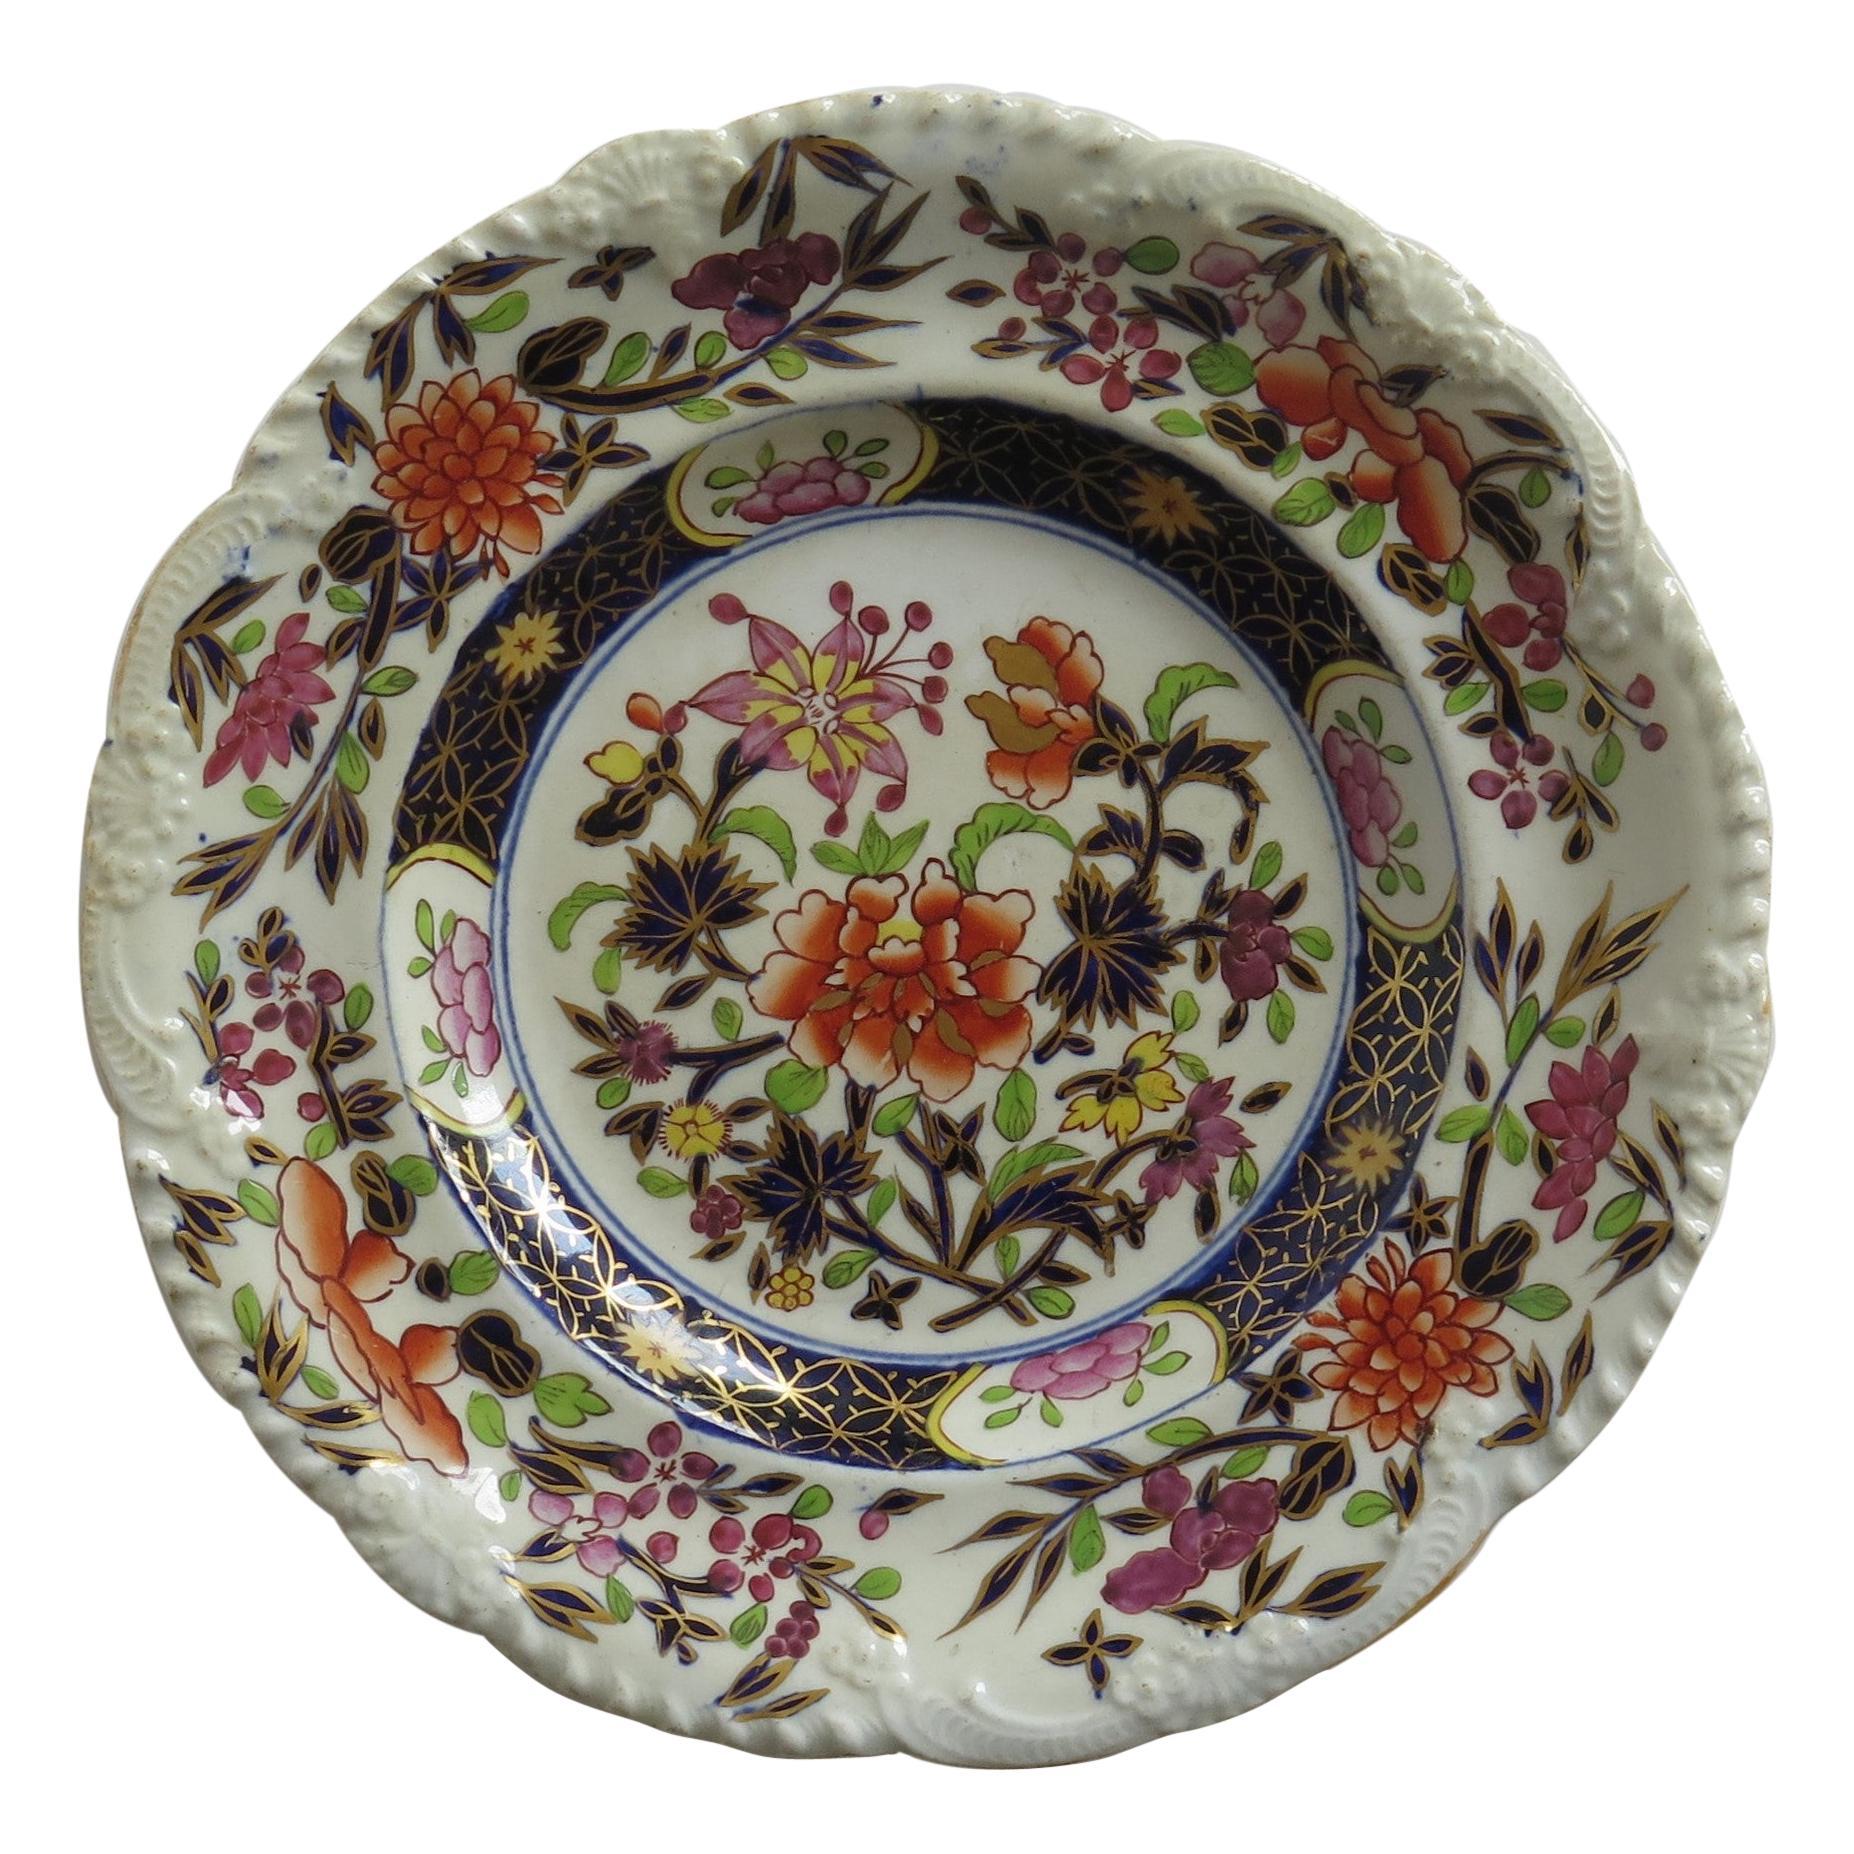 Georgian Mason's Ironstone Side Plate in Heavily Floral Japan Ptn, Circa 1815